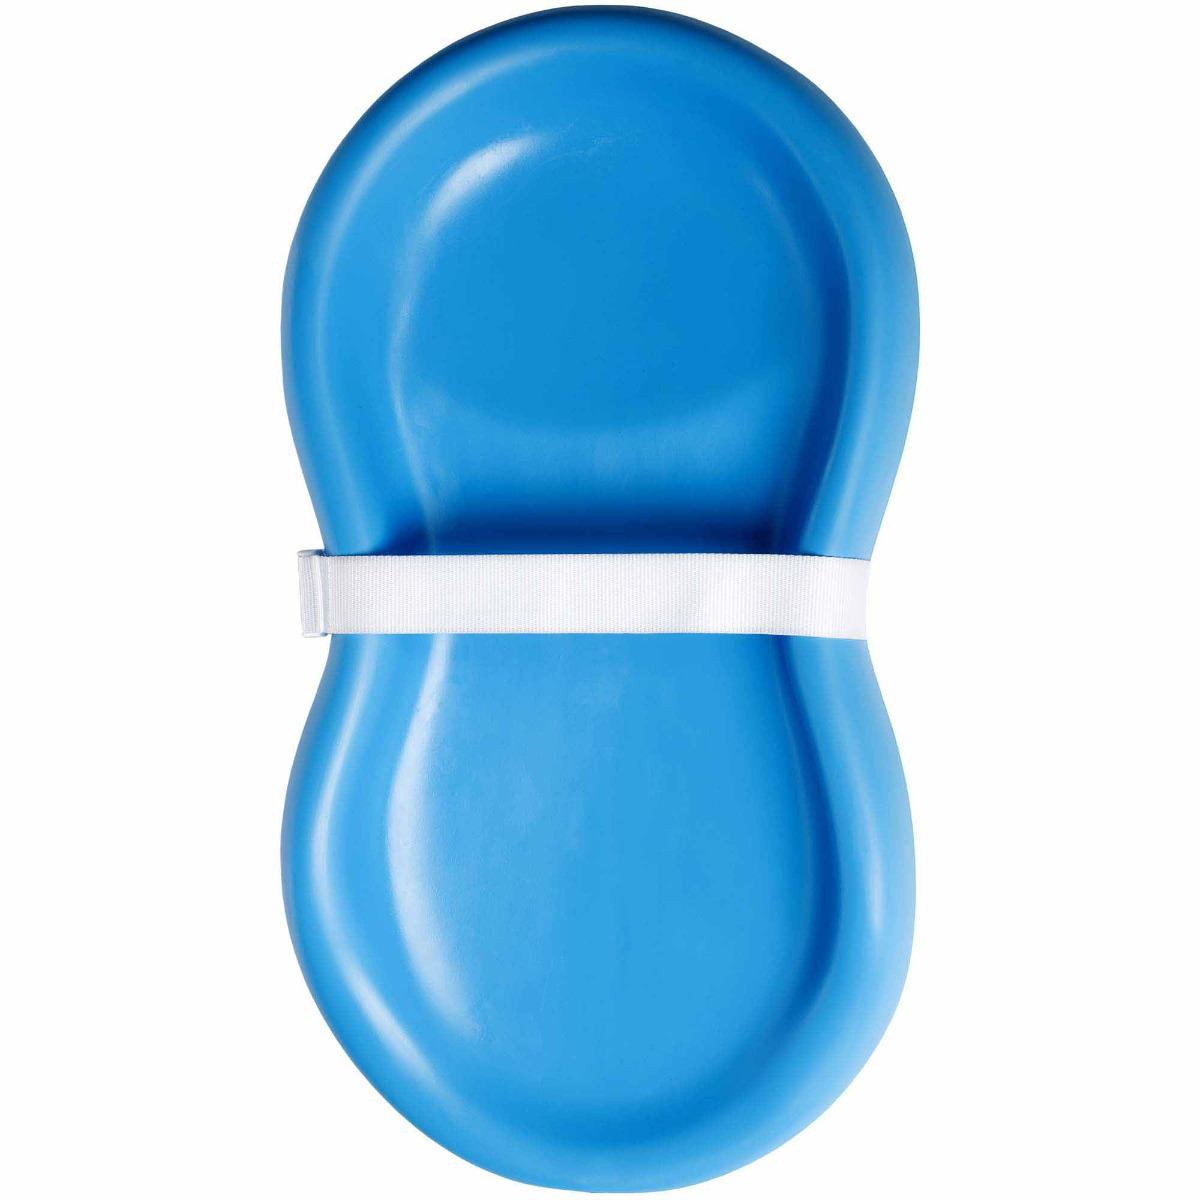 Keekaroo Peanut Diaper Changing Pad